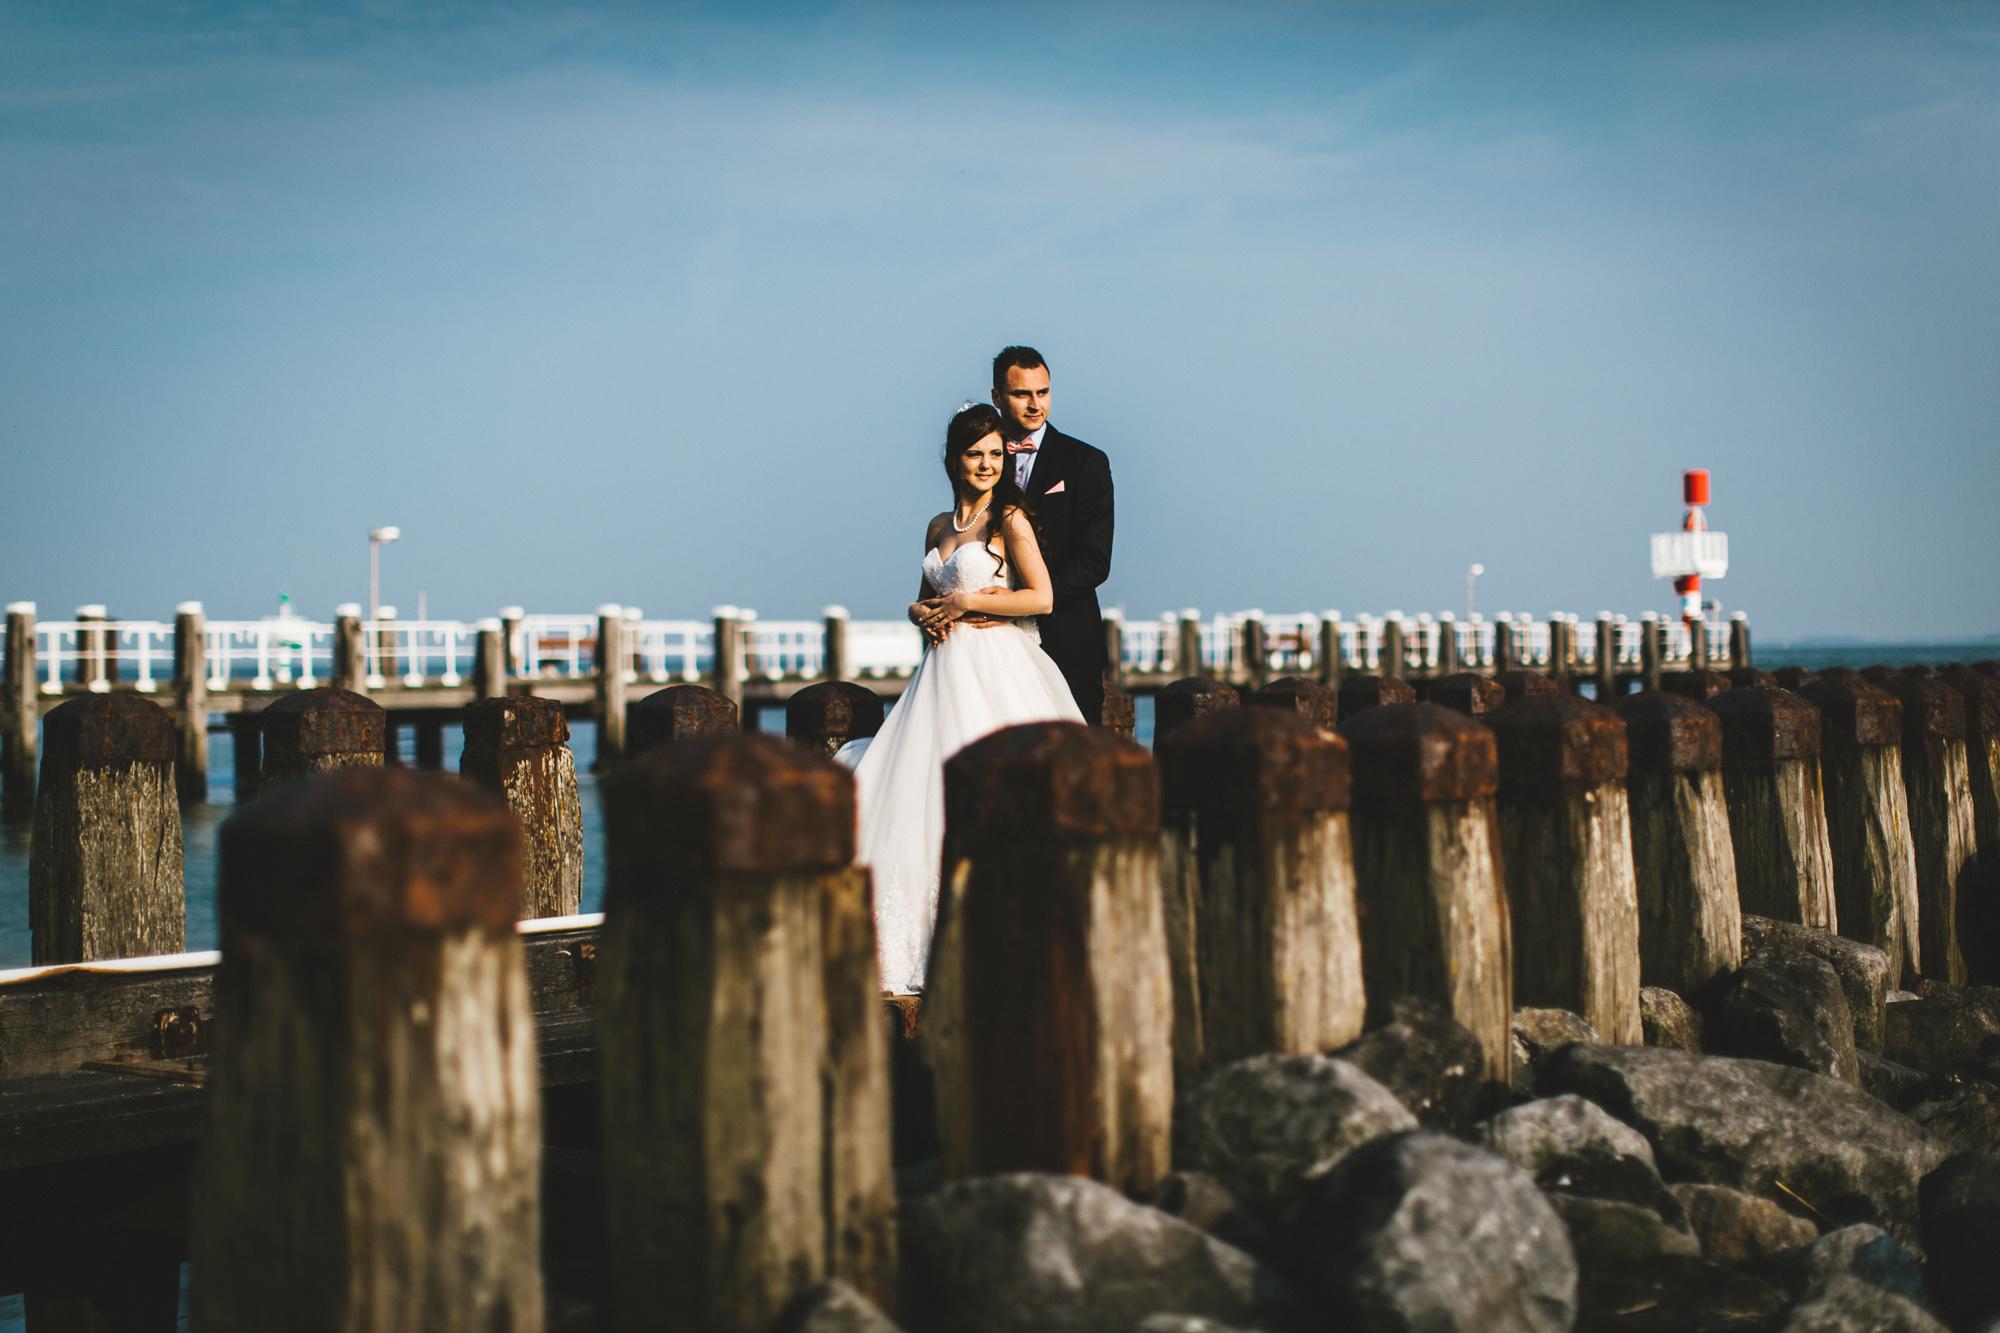 after wedding ia 041 - Afterwedding in Zeeland / Holland